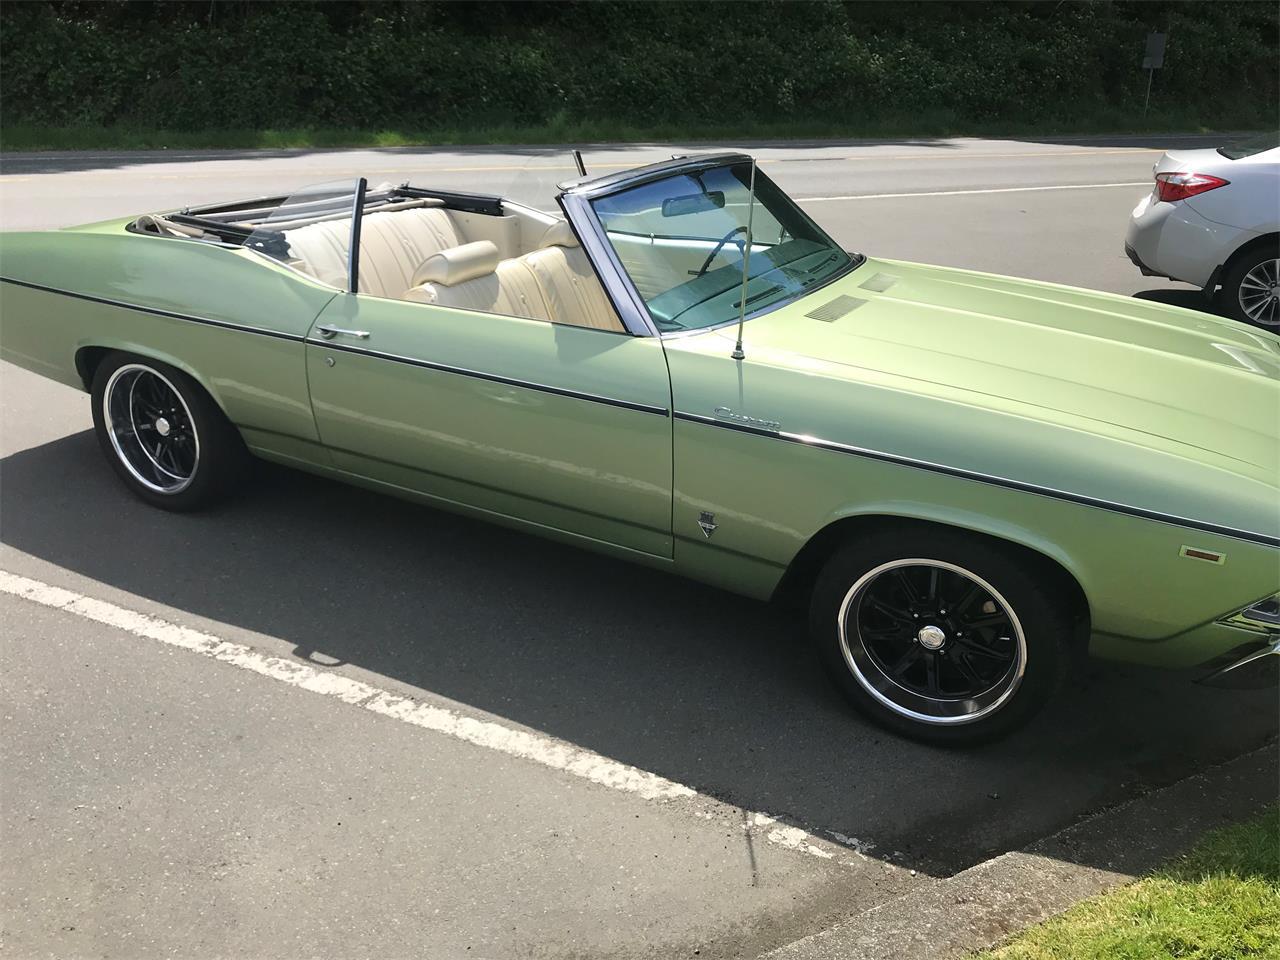 1969 Pontiac Beaumont (CC-1217590) for sale in Nanaimo, British Columbia